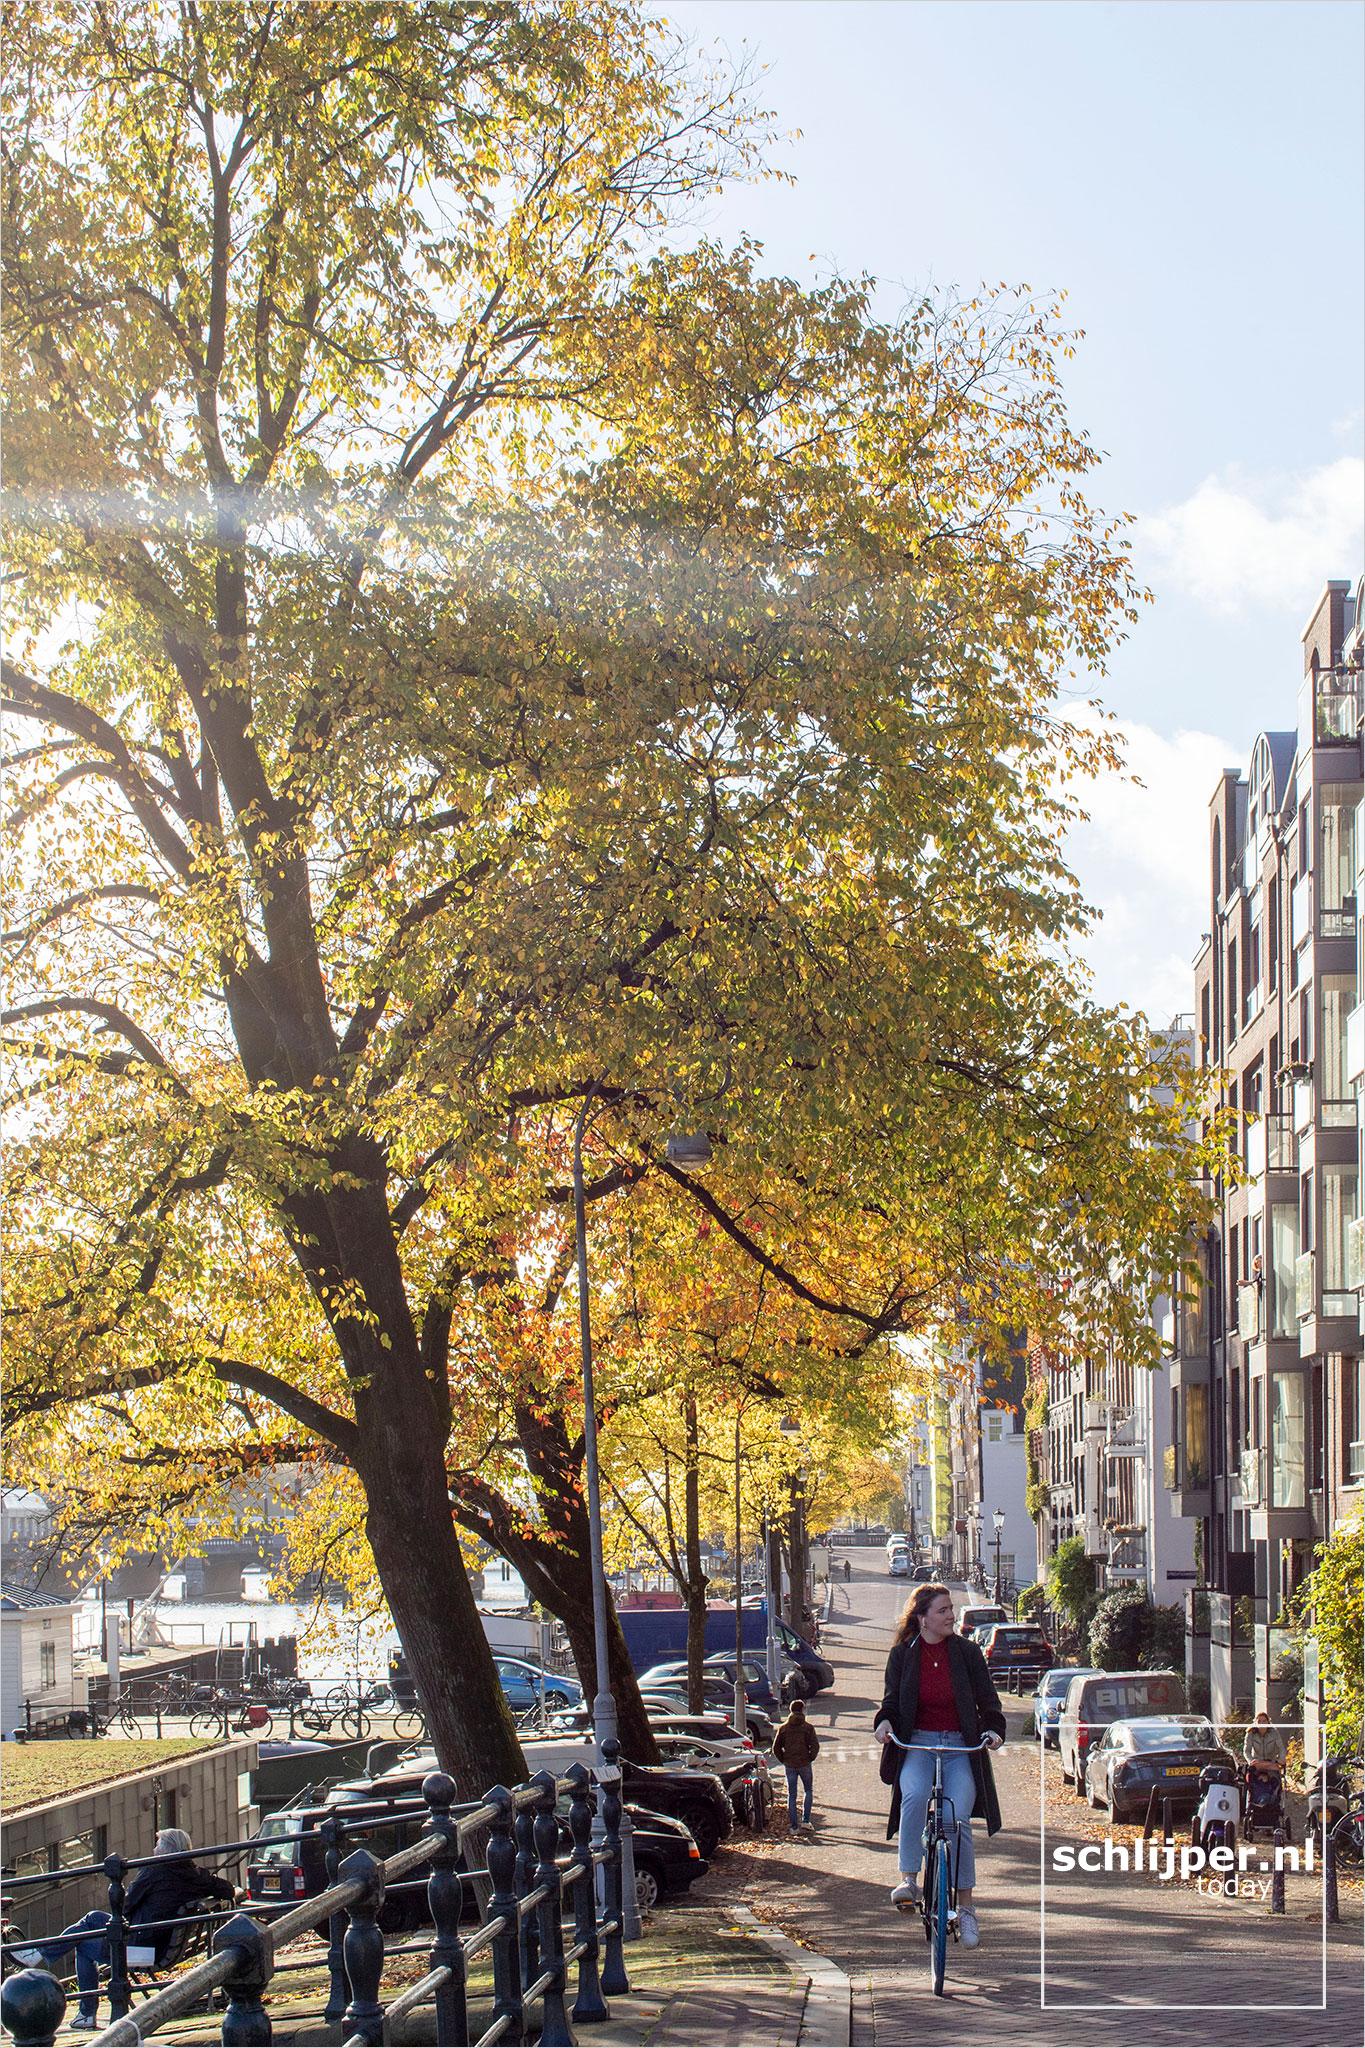 Nederland, Amsterdam, 22 oktober 2020